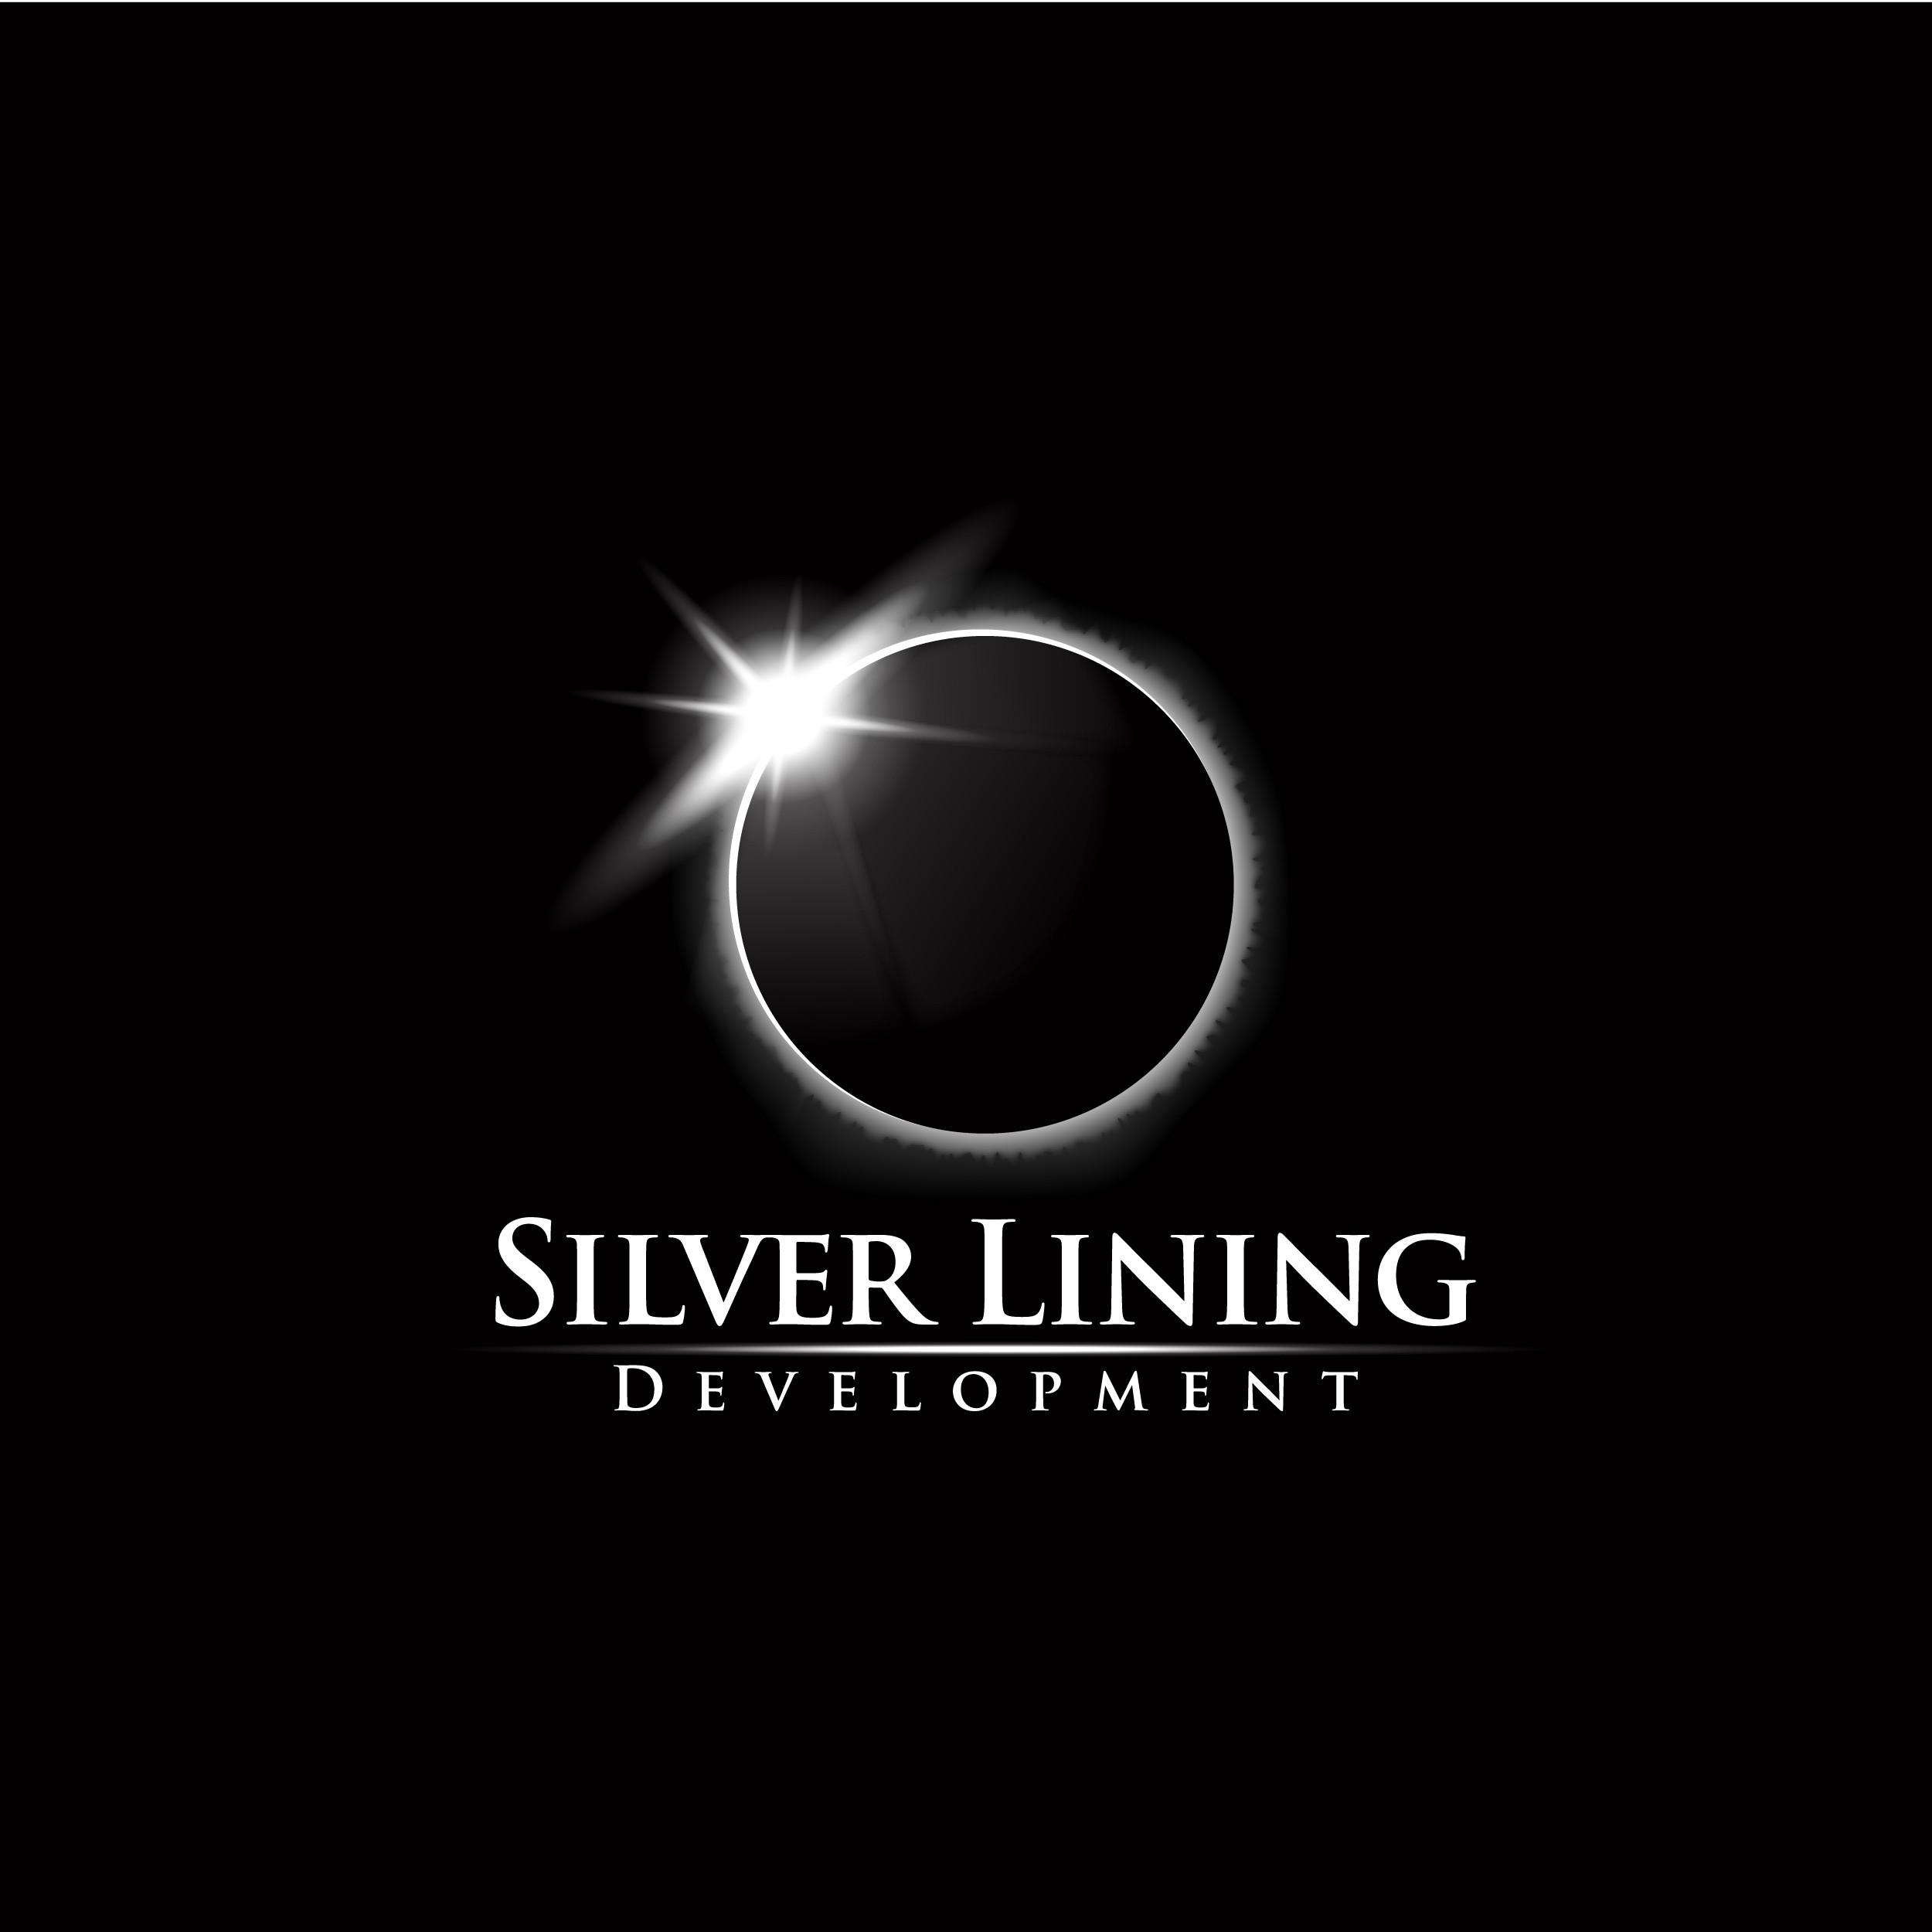 Silver Lining Development